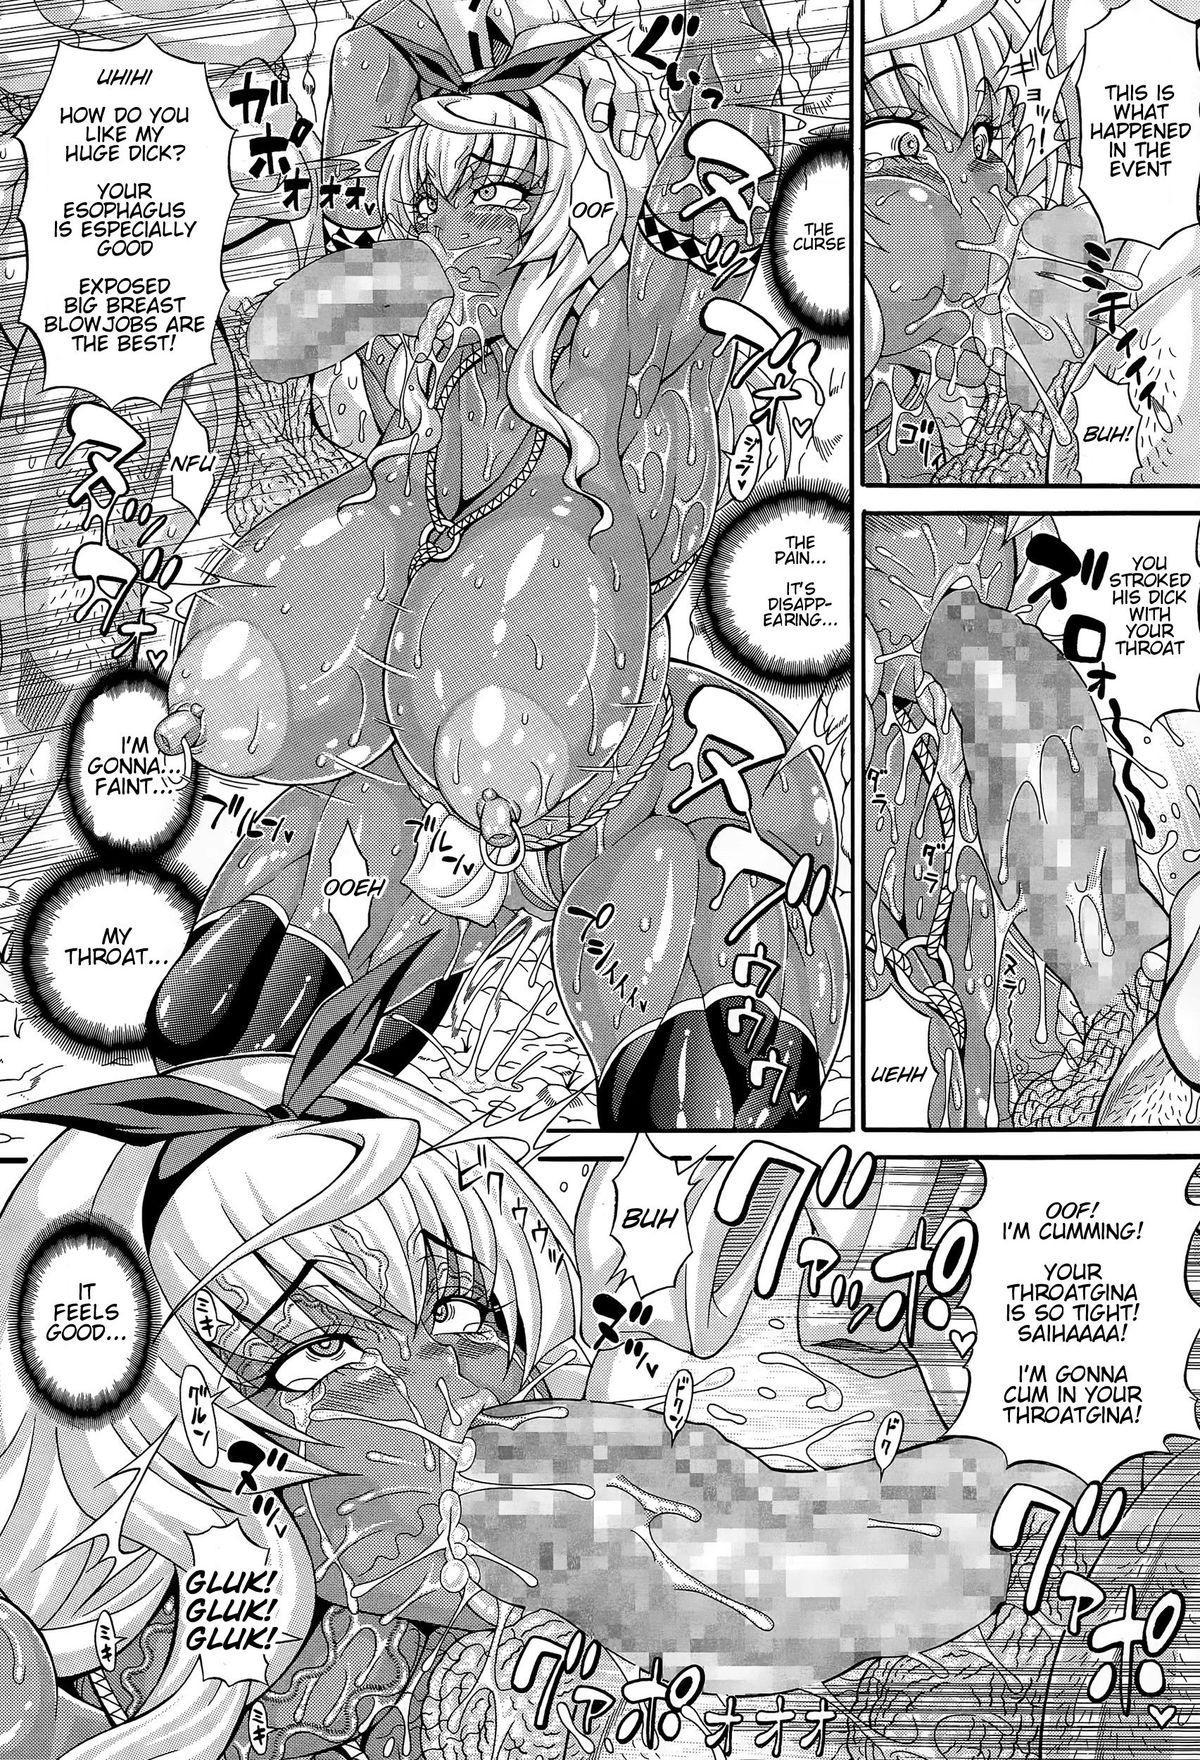 [Andou Hiroyuki] Mahoutsukai Musou ~Sengoku Pakohime Kasshoku Kinniku Onna Hen~   Peerless 30 Year Old Virgin - Warring States Muscled Brown Fuck Princess (COMIC Tenma 2015-06) [English] [Natty Translations] 5